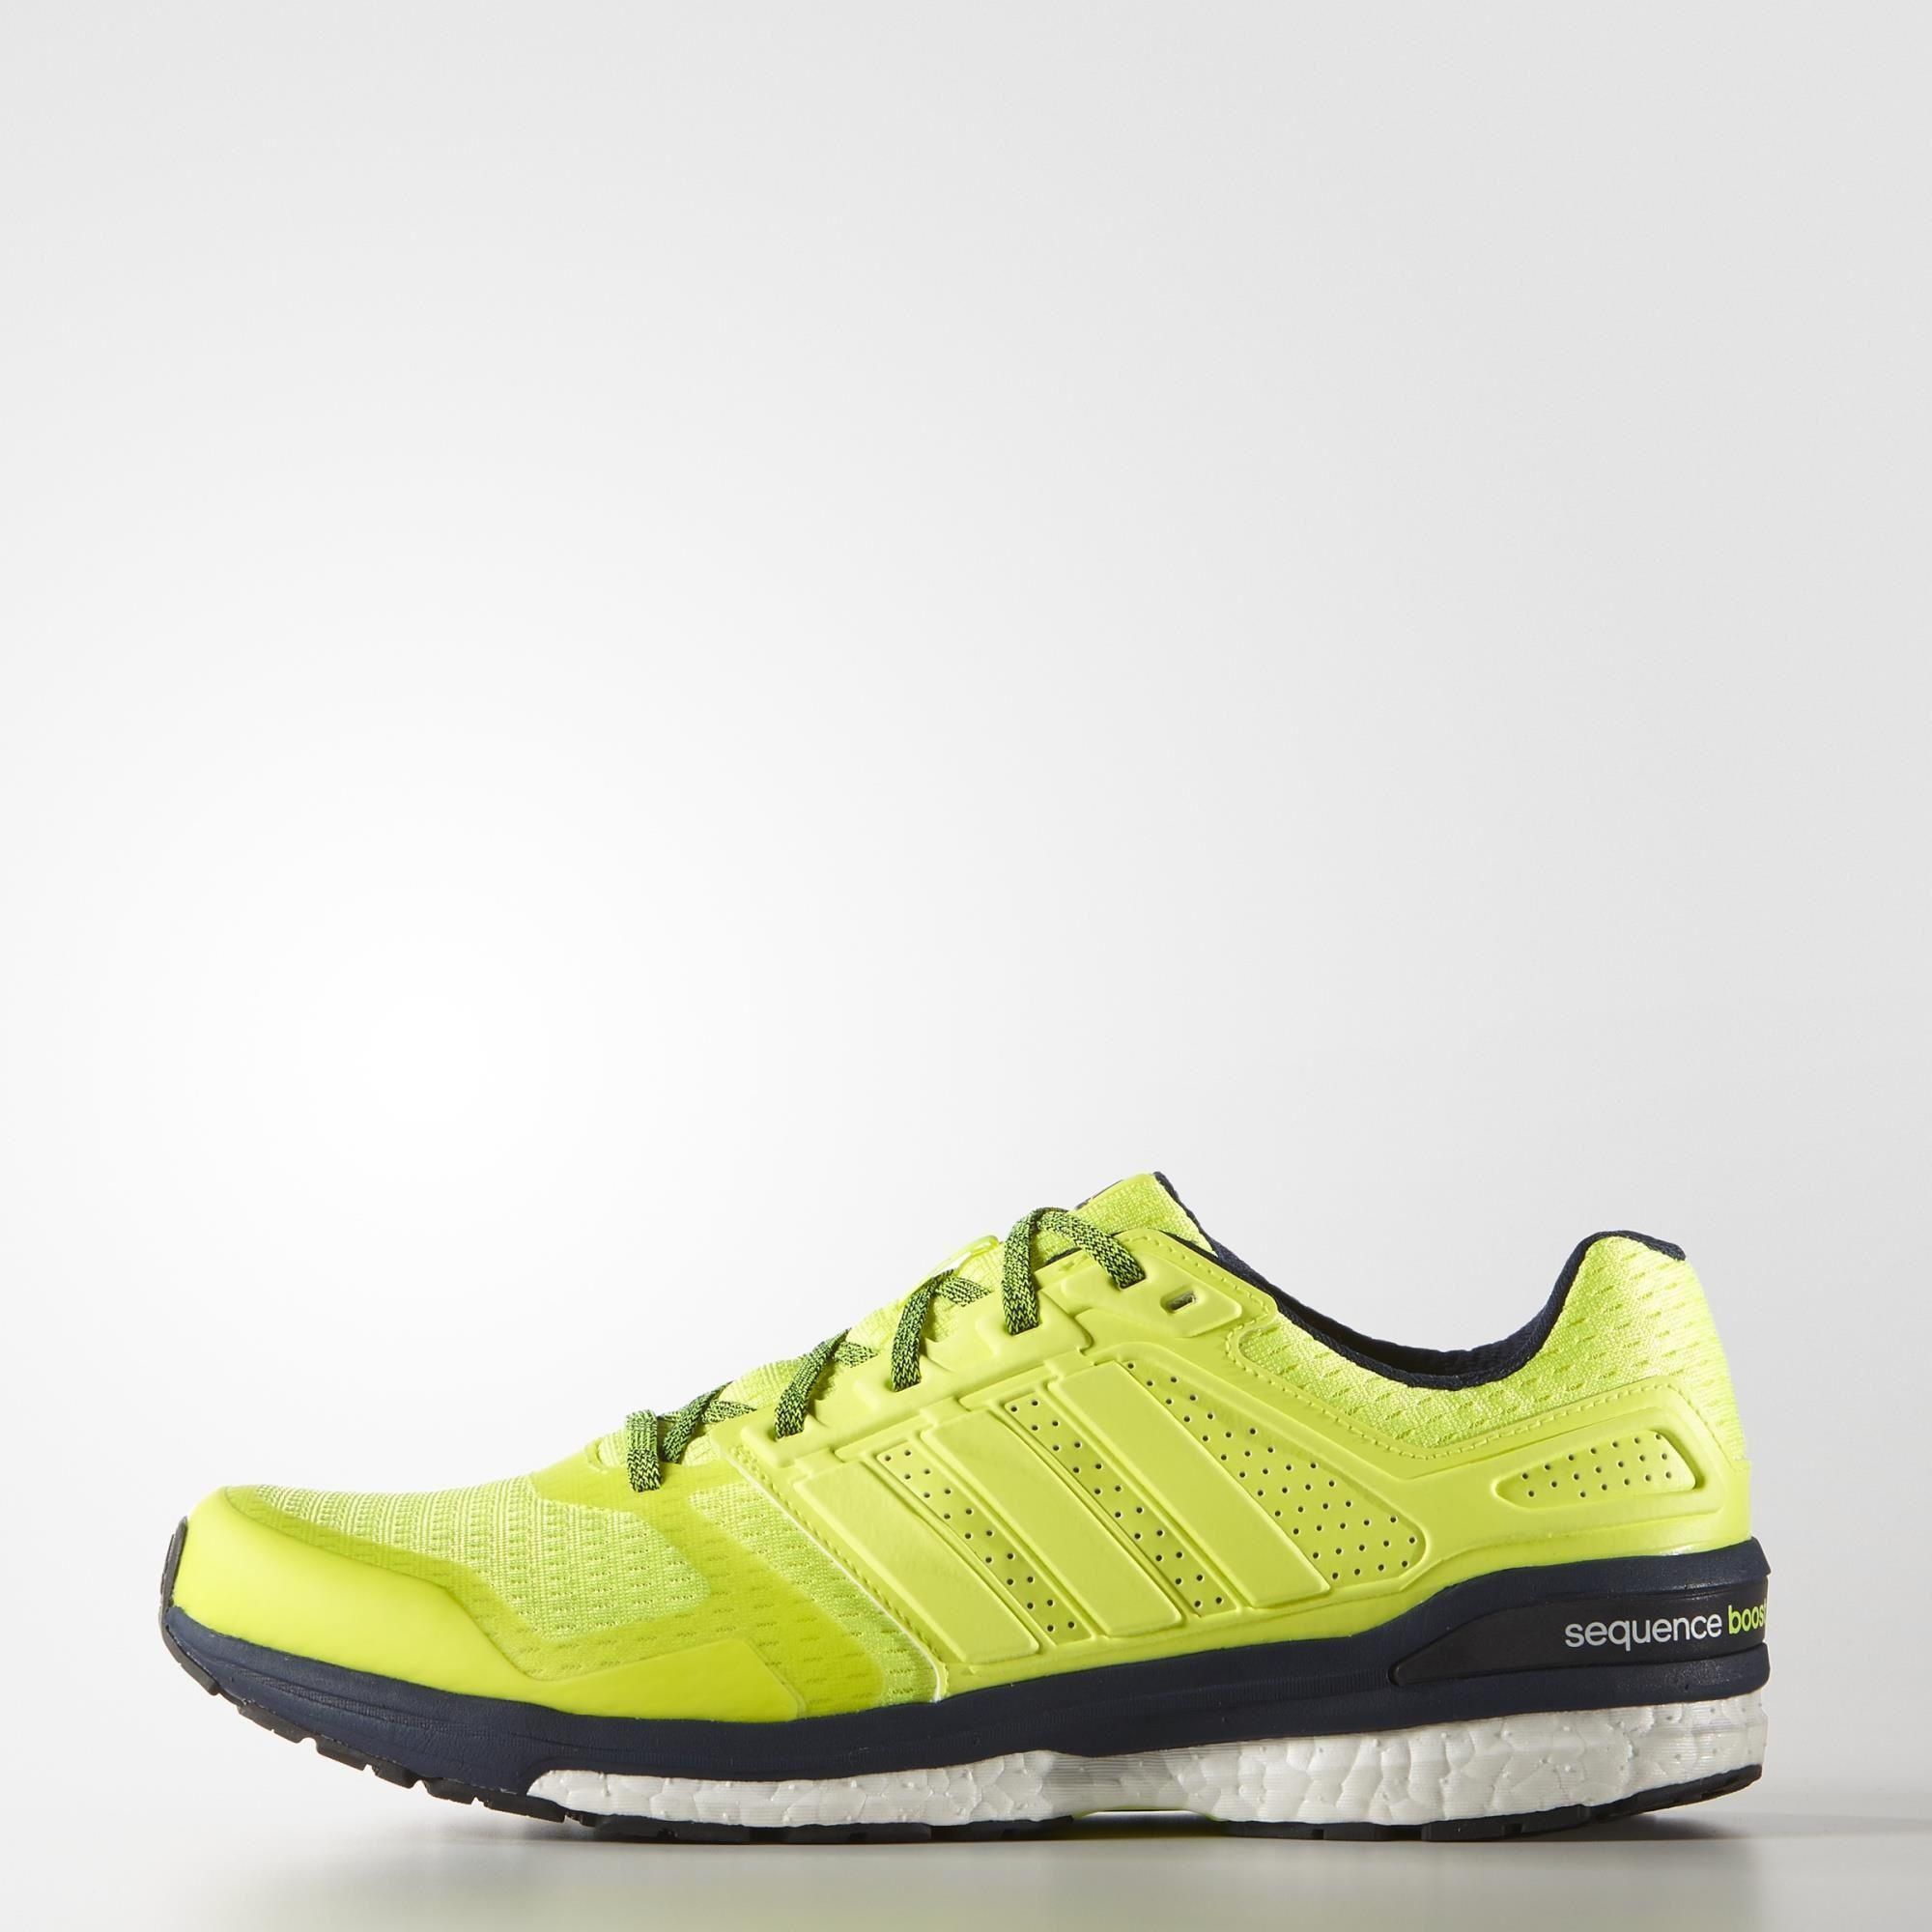 35a697891c20f Adidas Mens Supernova Sequence Boost 8 Running Shoes - Yellow -  Tennisnuts.com